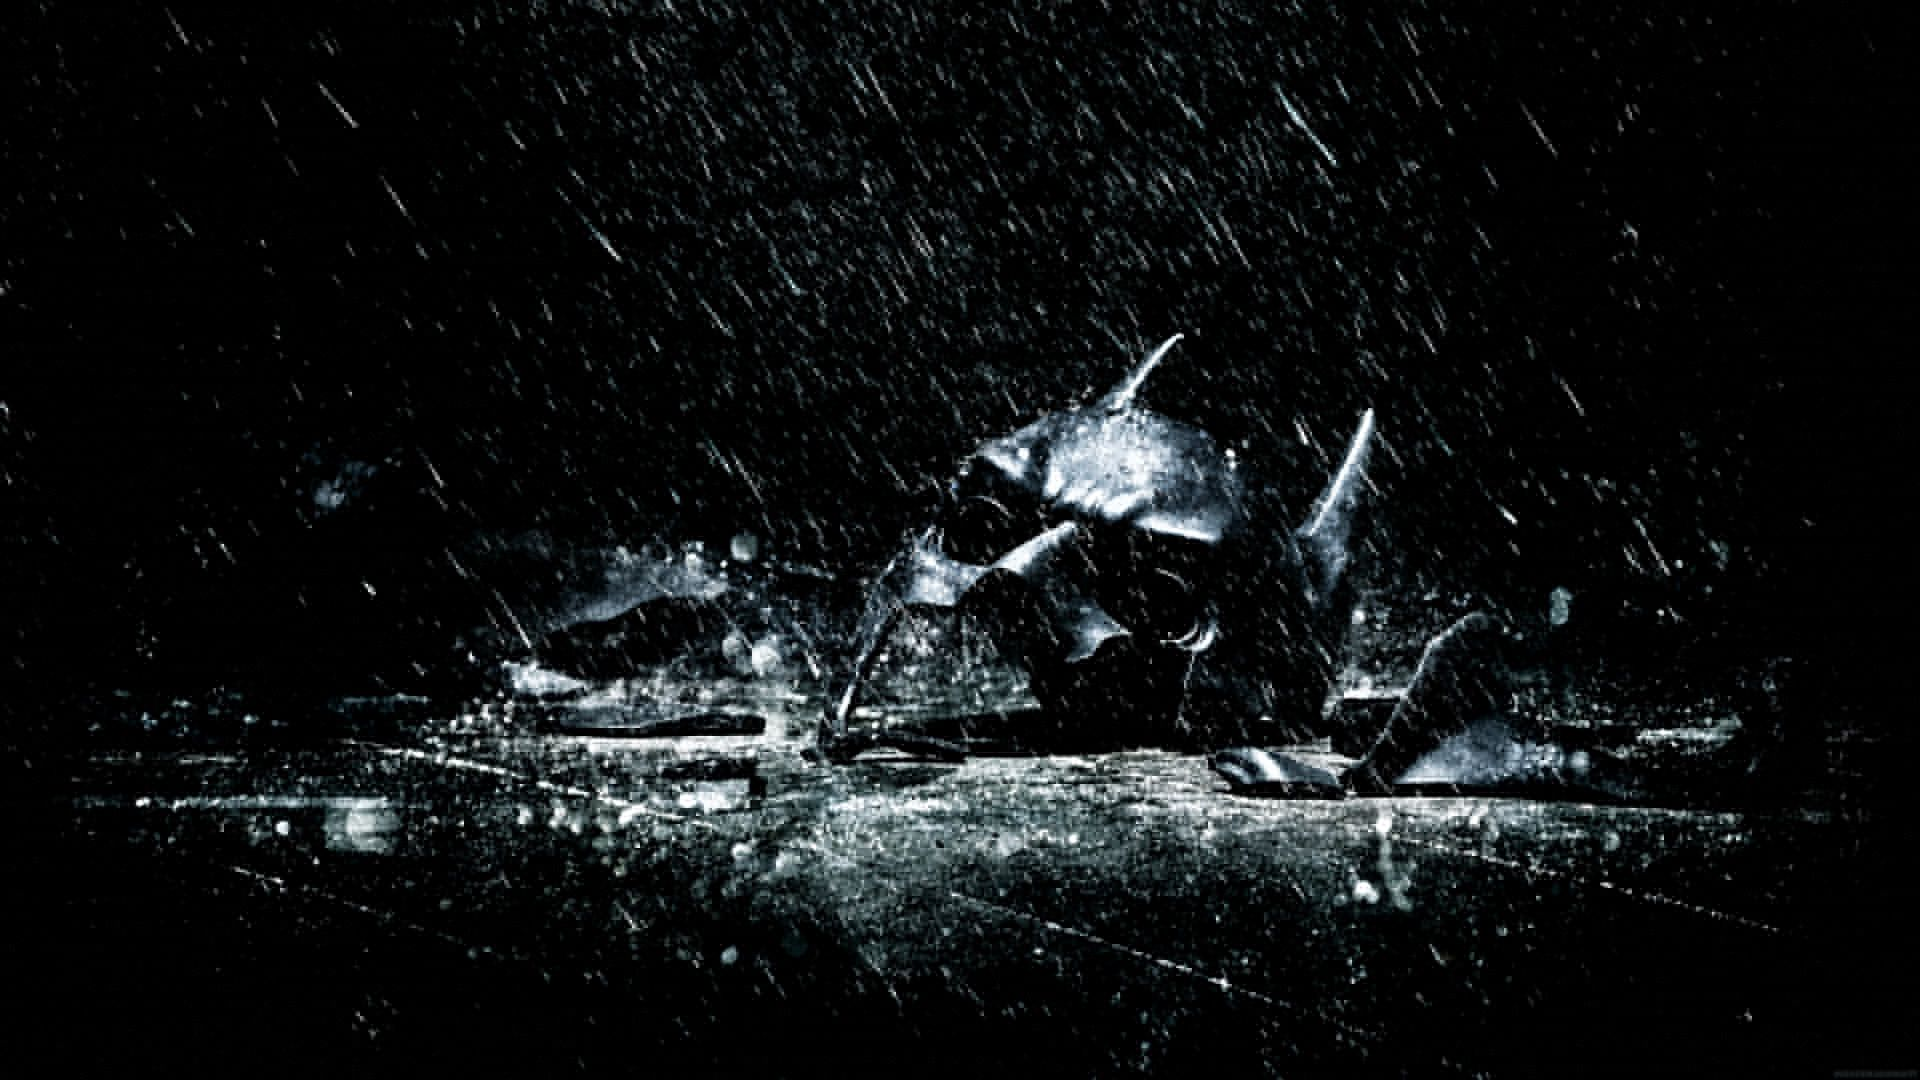 Free Download Batman Dark Knight Wallpaper High Resolution Flip